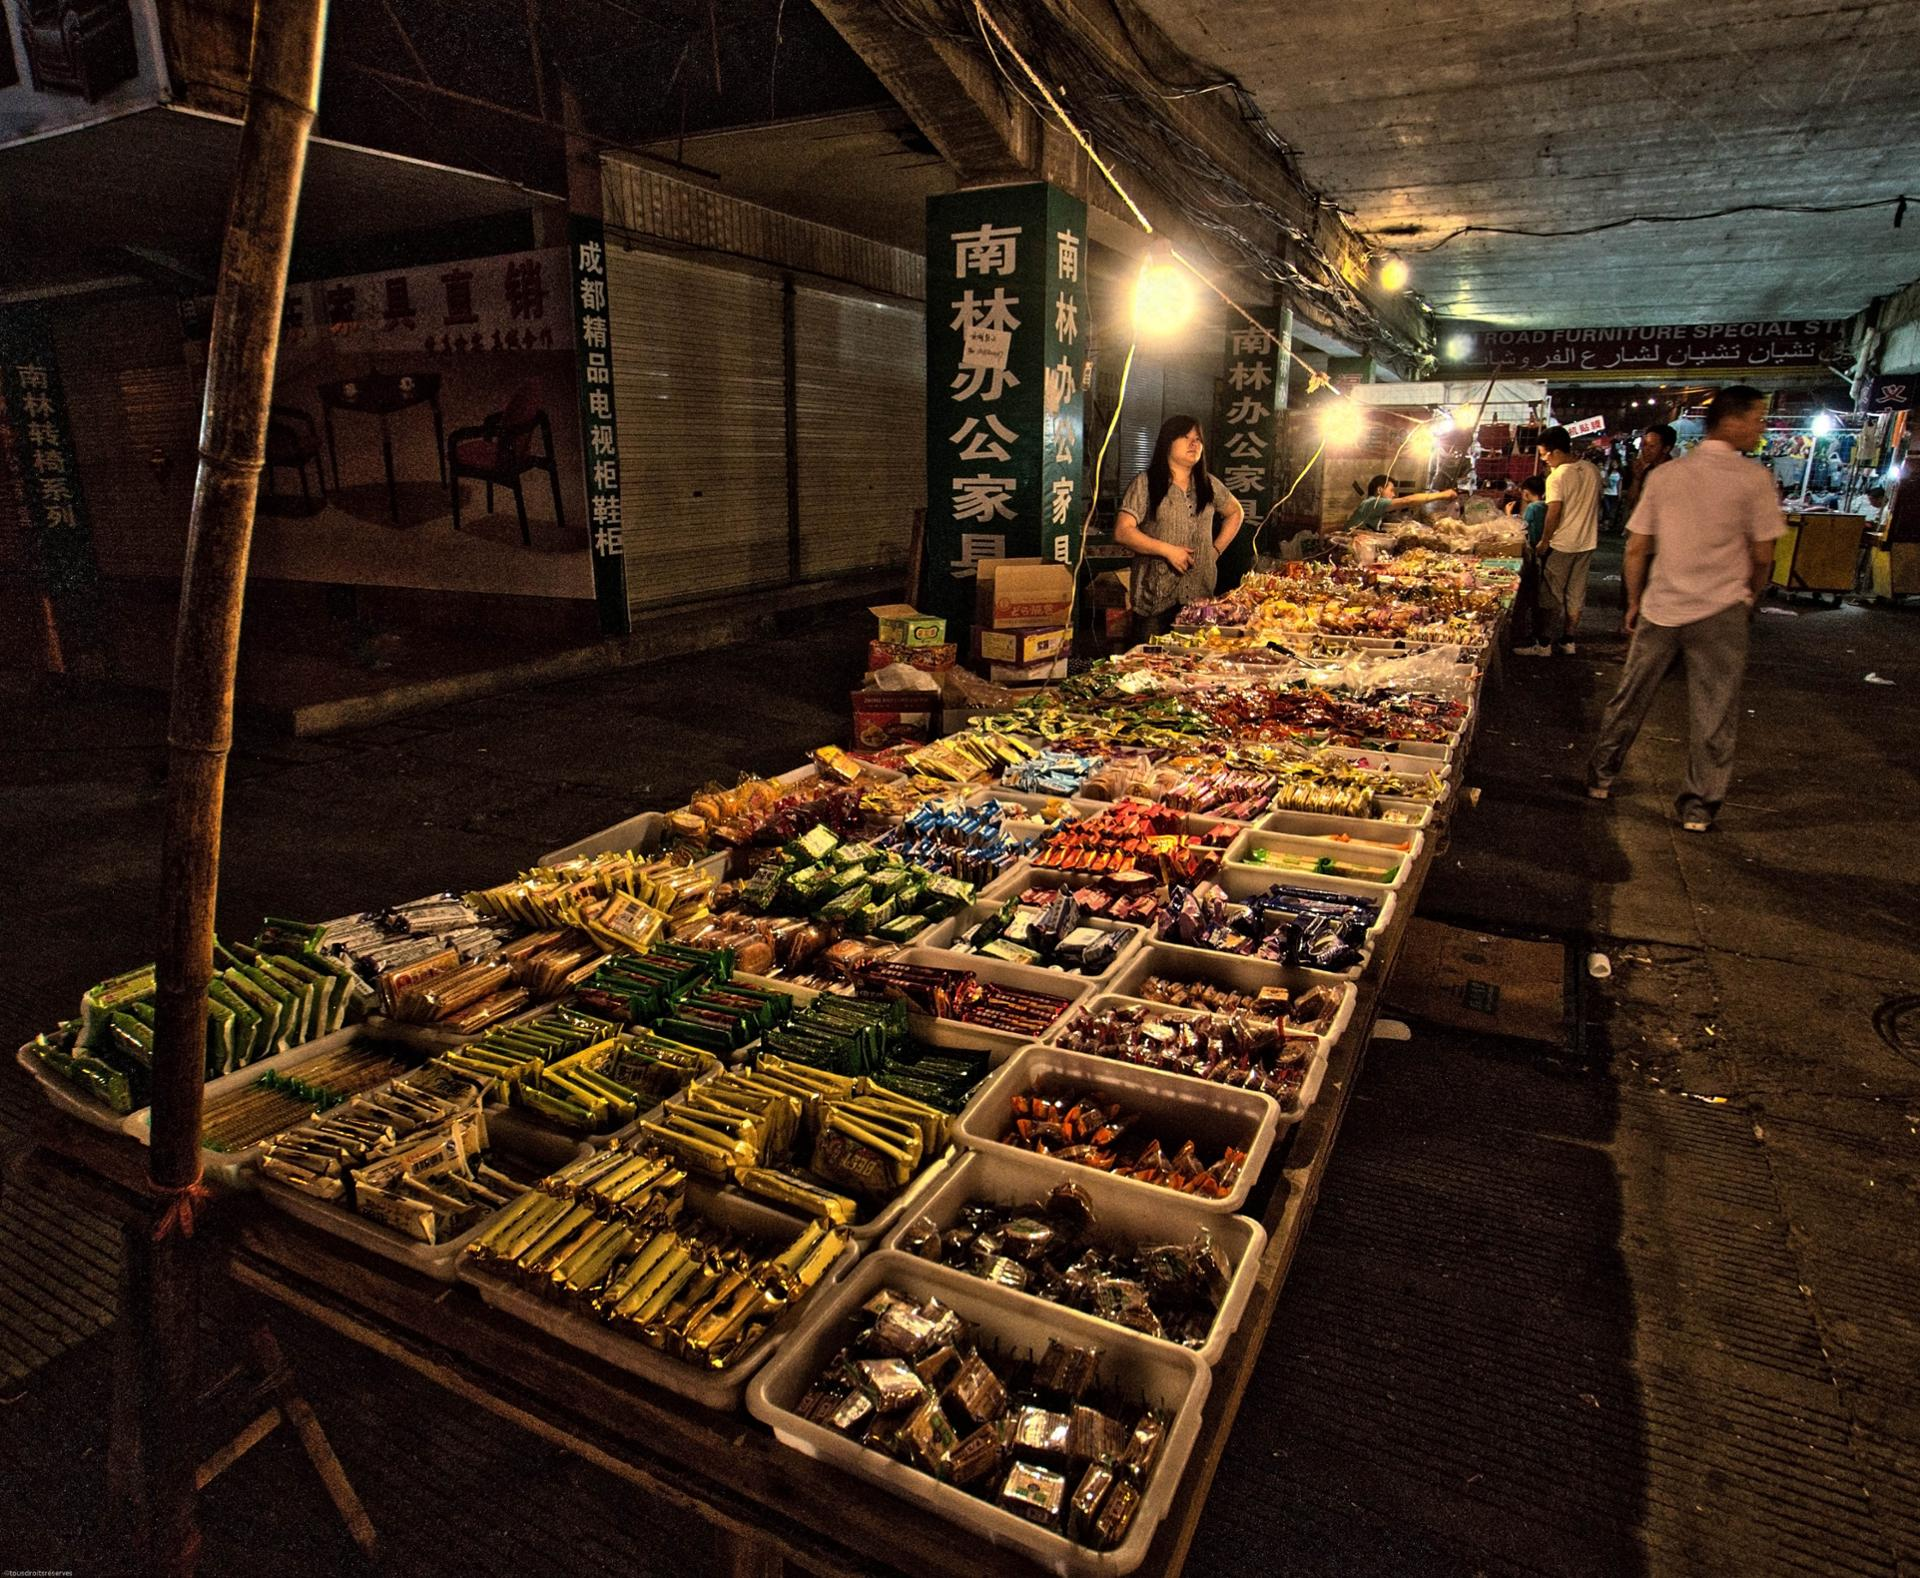 Marche de nuit,Yiwu,Chine